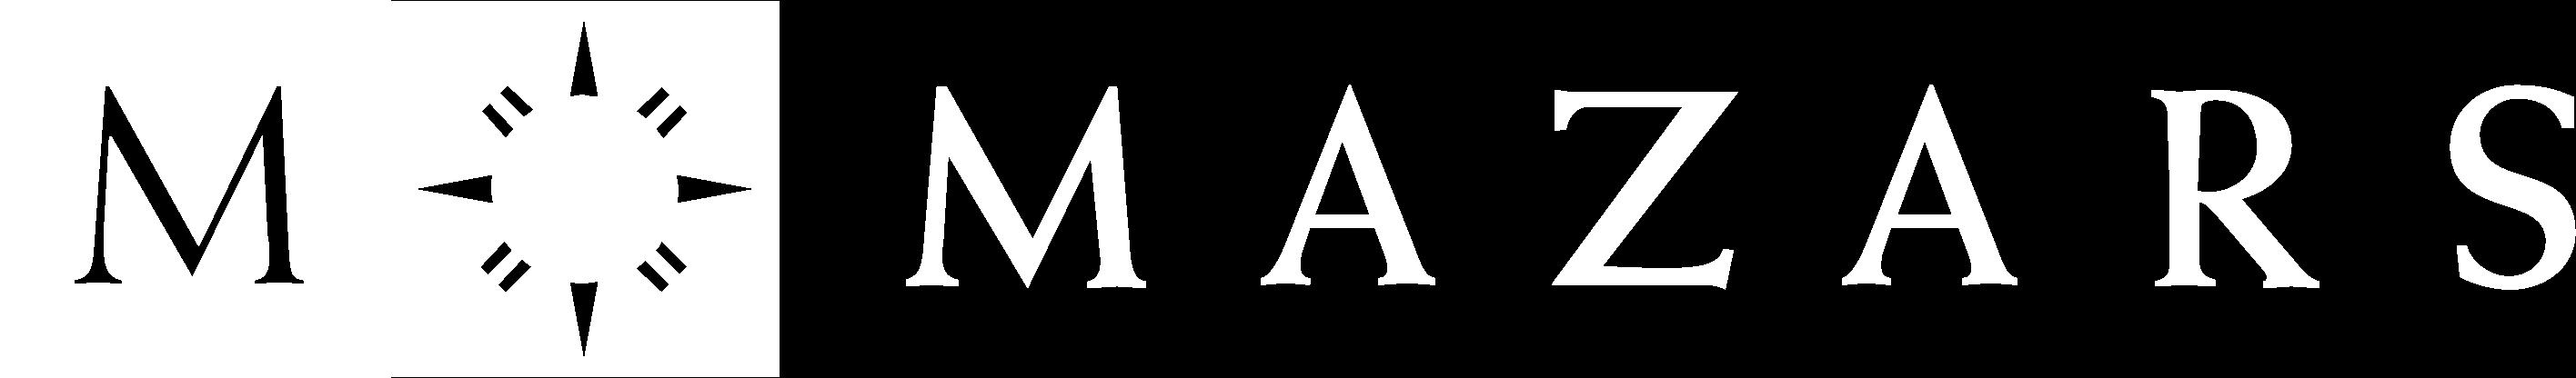 10 logo mazars